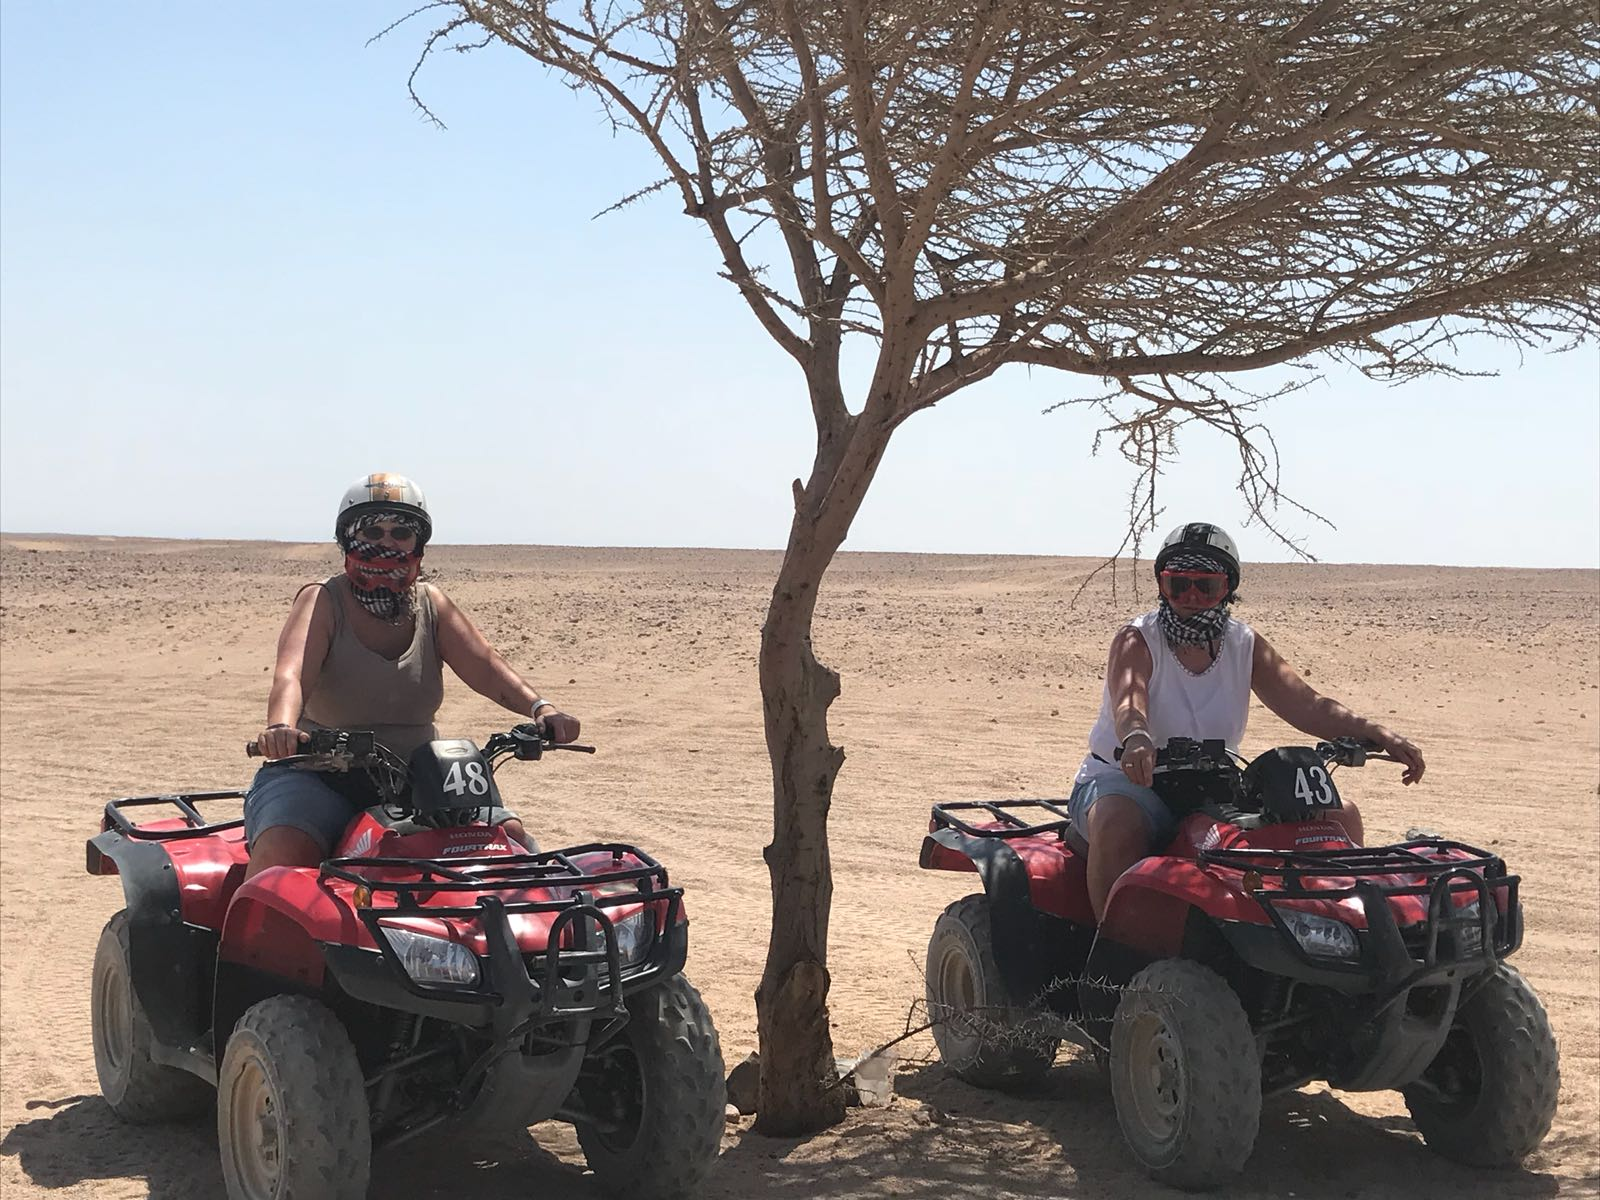 Hurghada Wüstenasusflüge & Wüstensafari